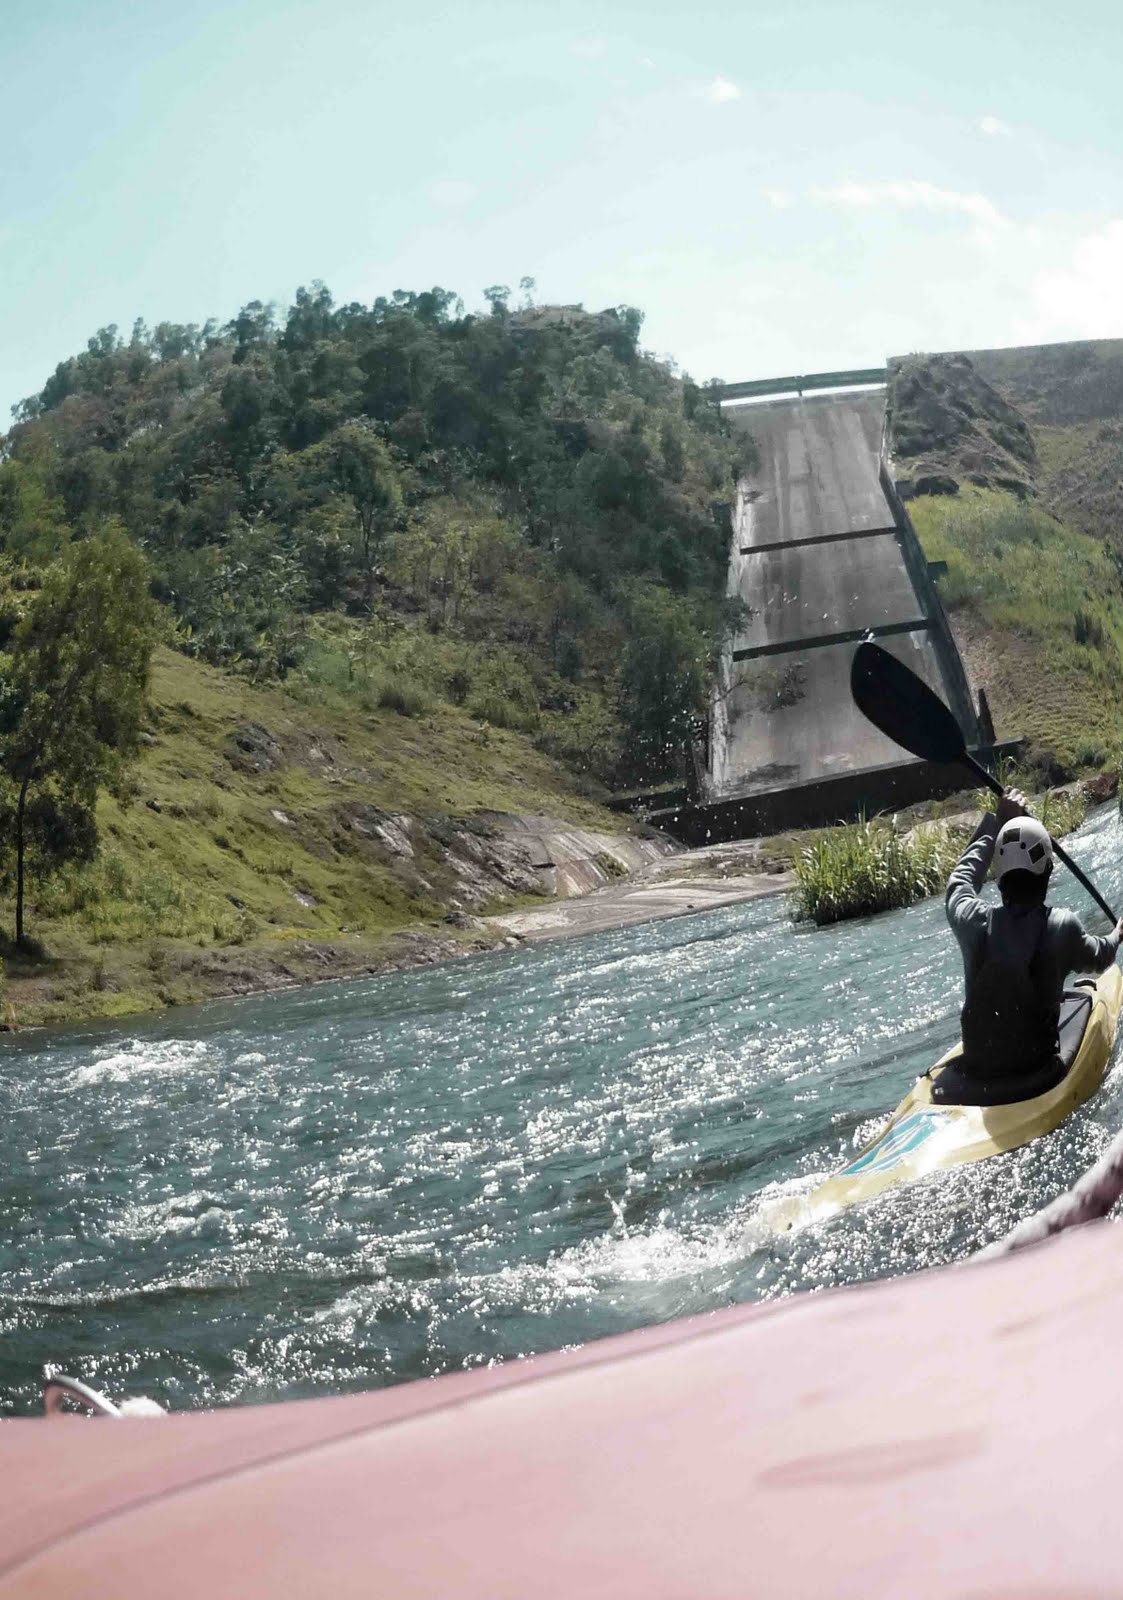 Tempat wisata di daerah kabupaten kebumen